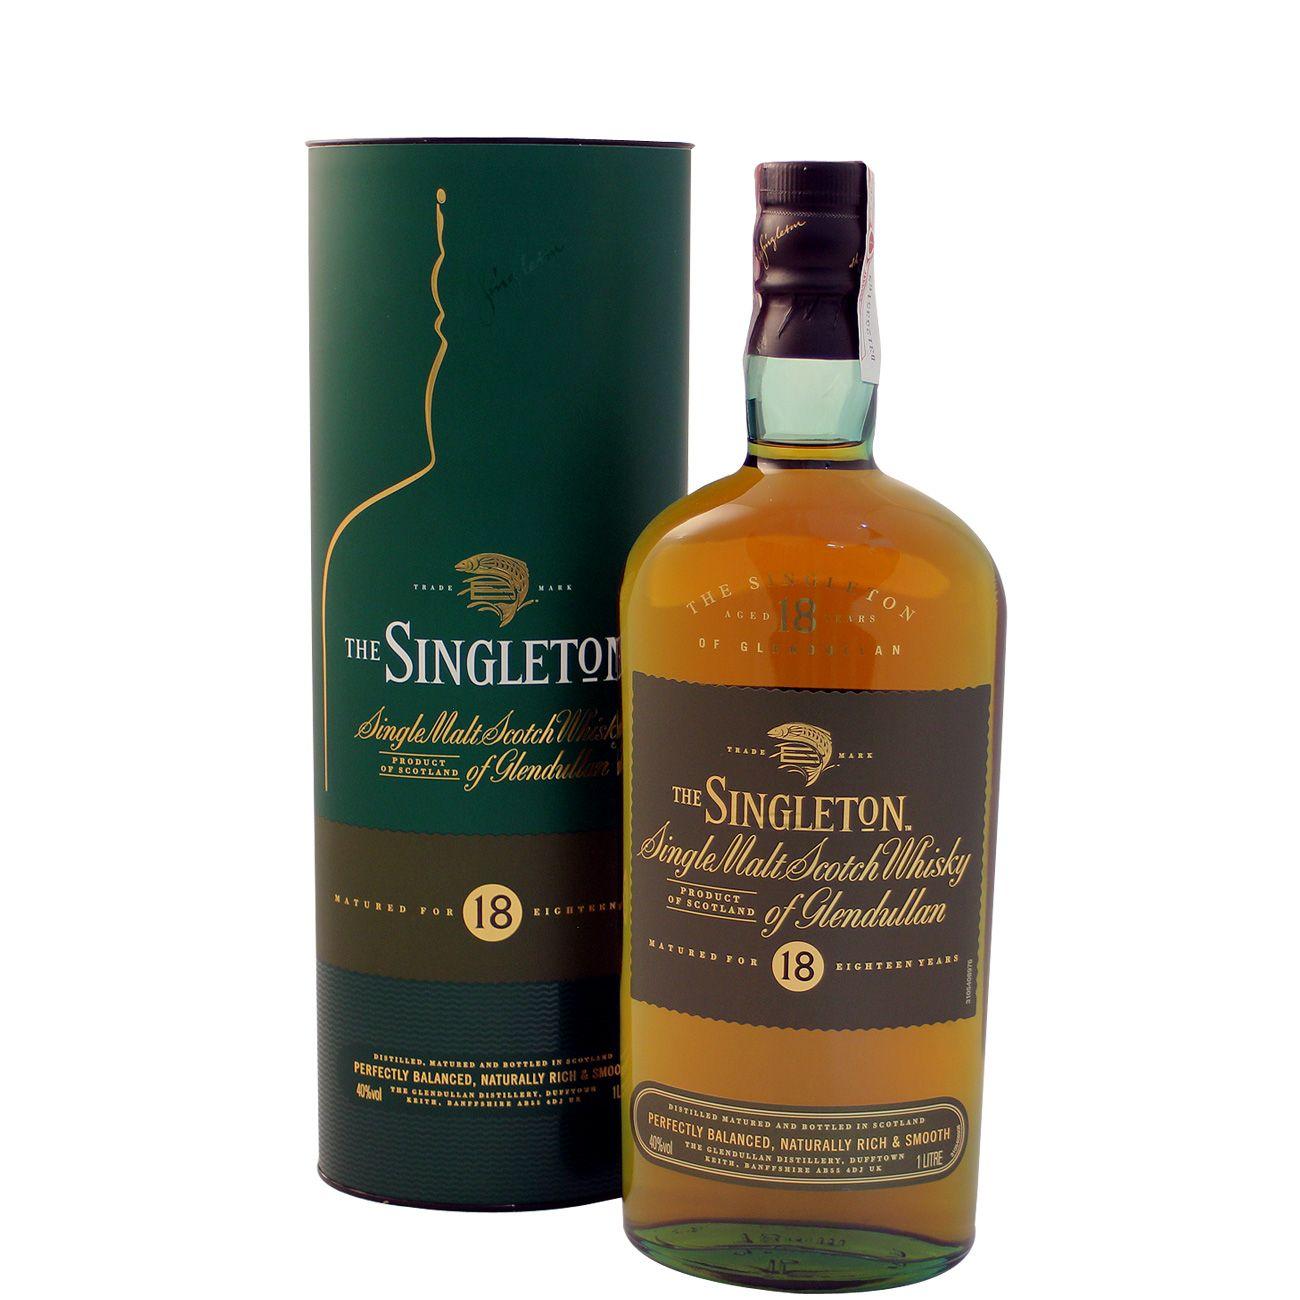 8184d7556e Whisky The Singleton of Glendullan 18 Years 1 L 40% Vol.